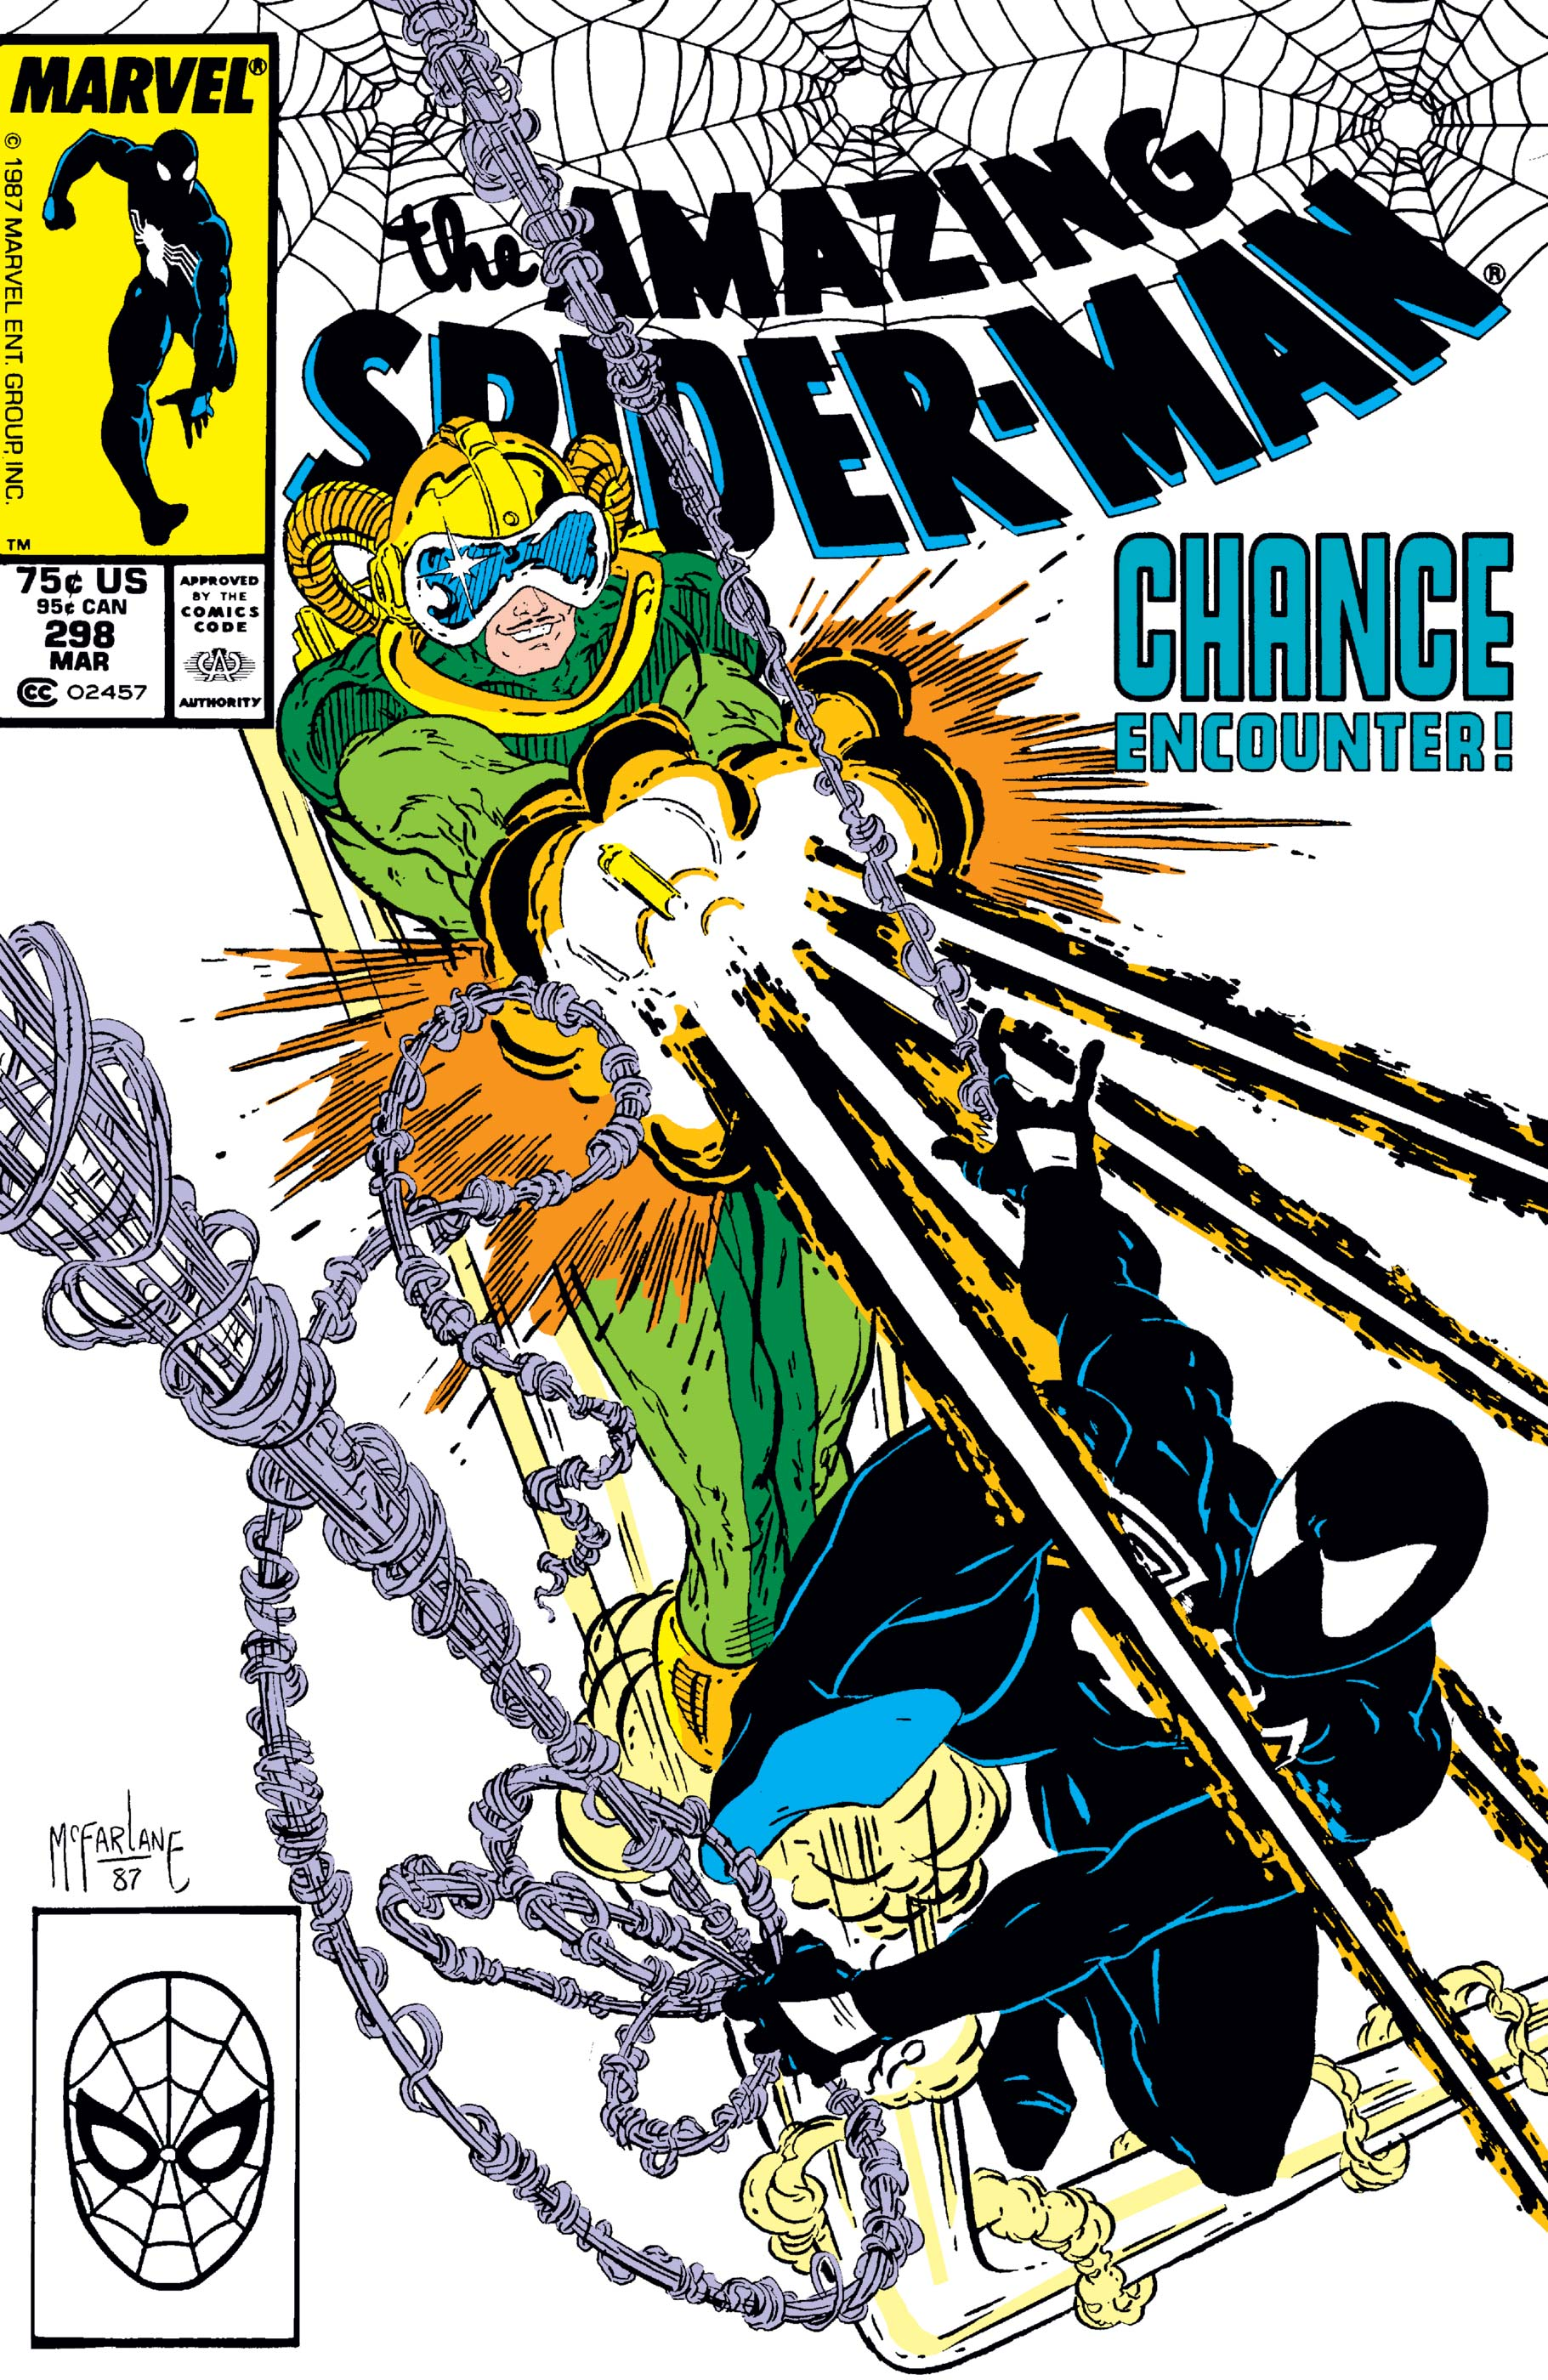 The Amazing Spider-Man (1963) #298